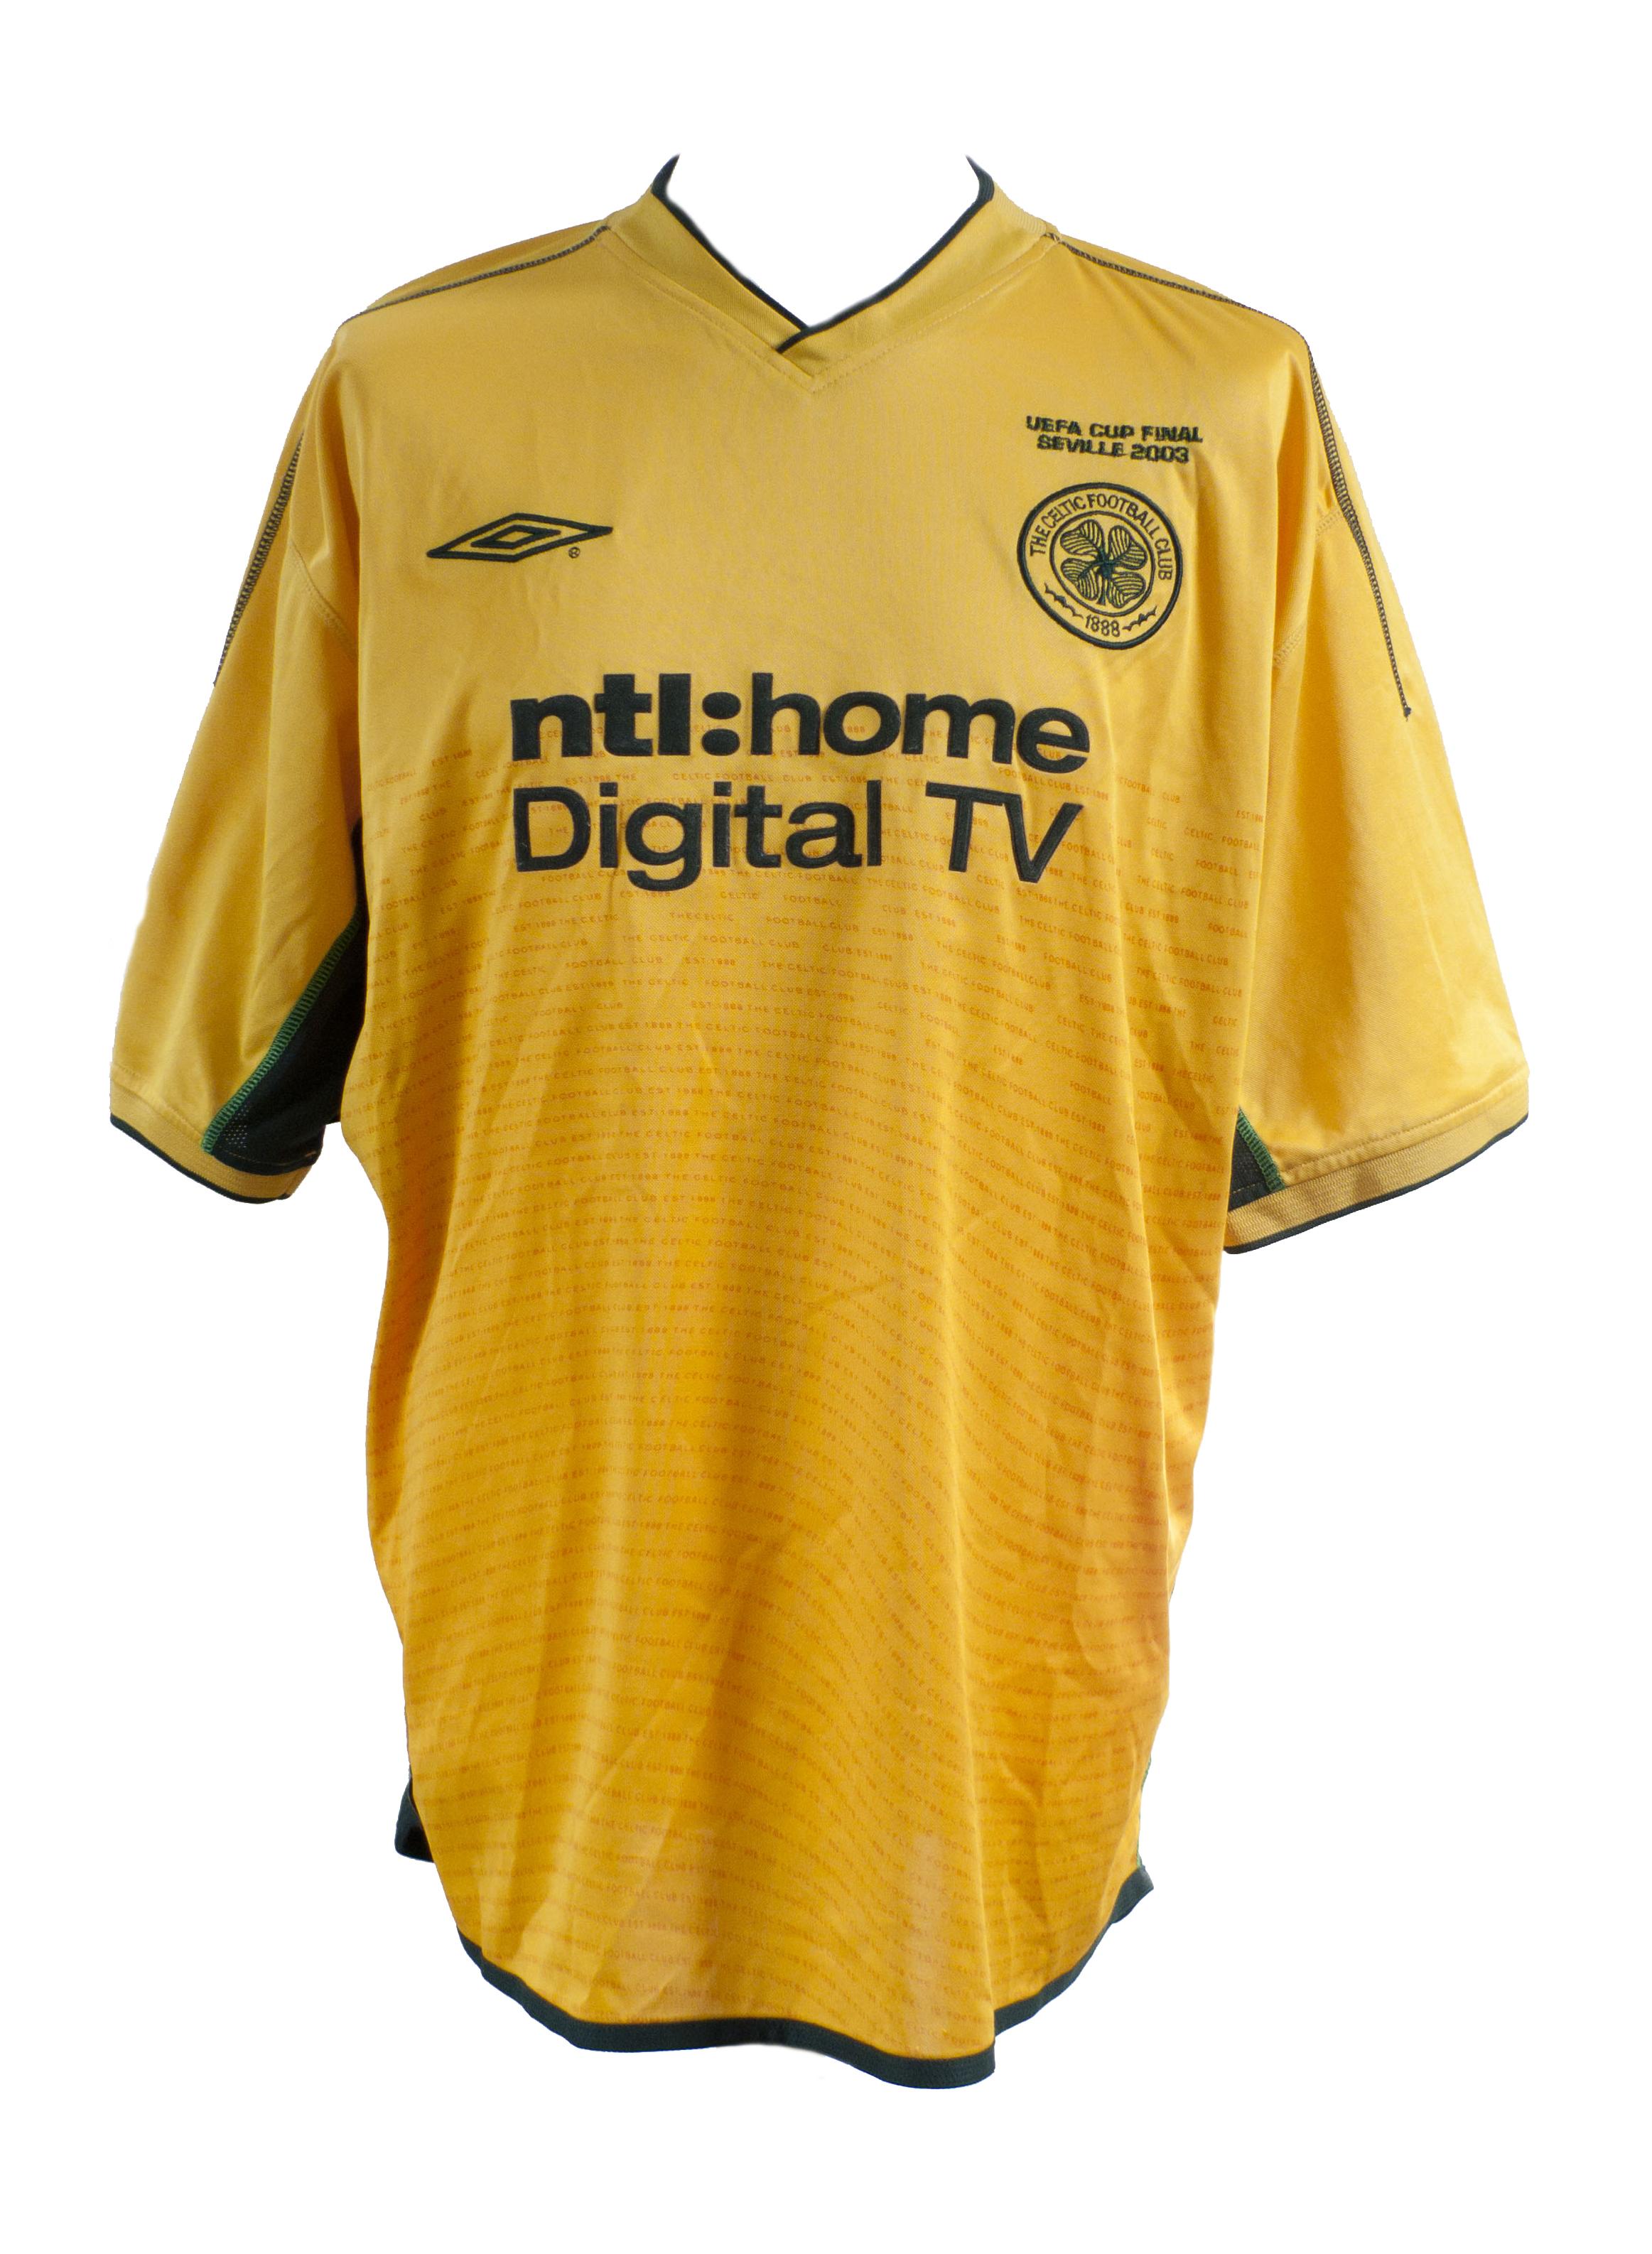 bobo-balde-uefa-cup-final-2003-front